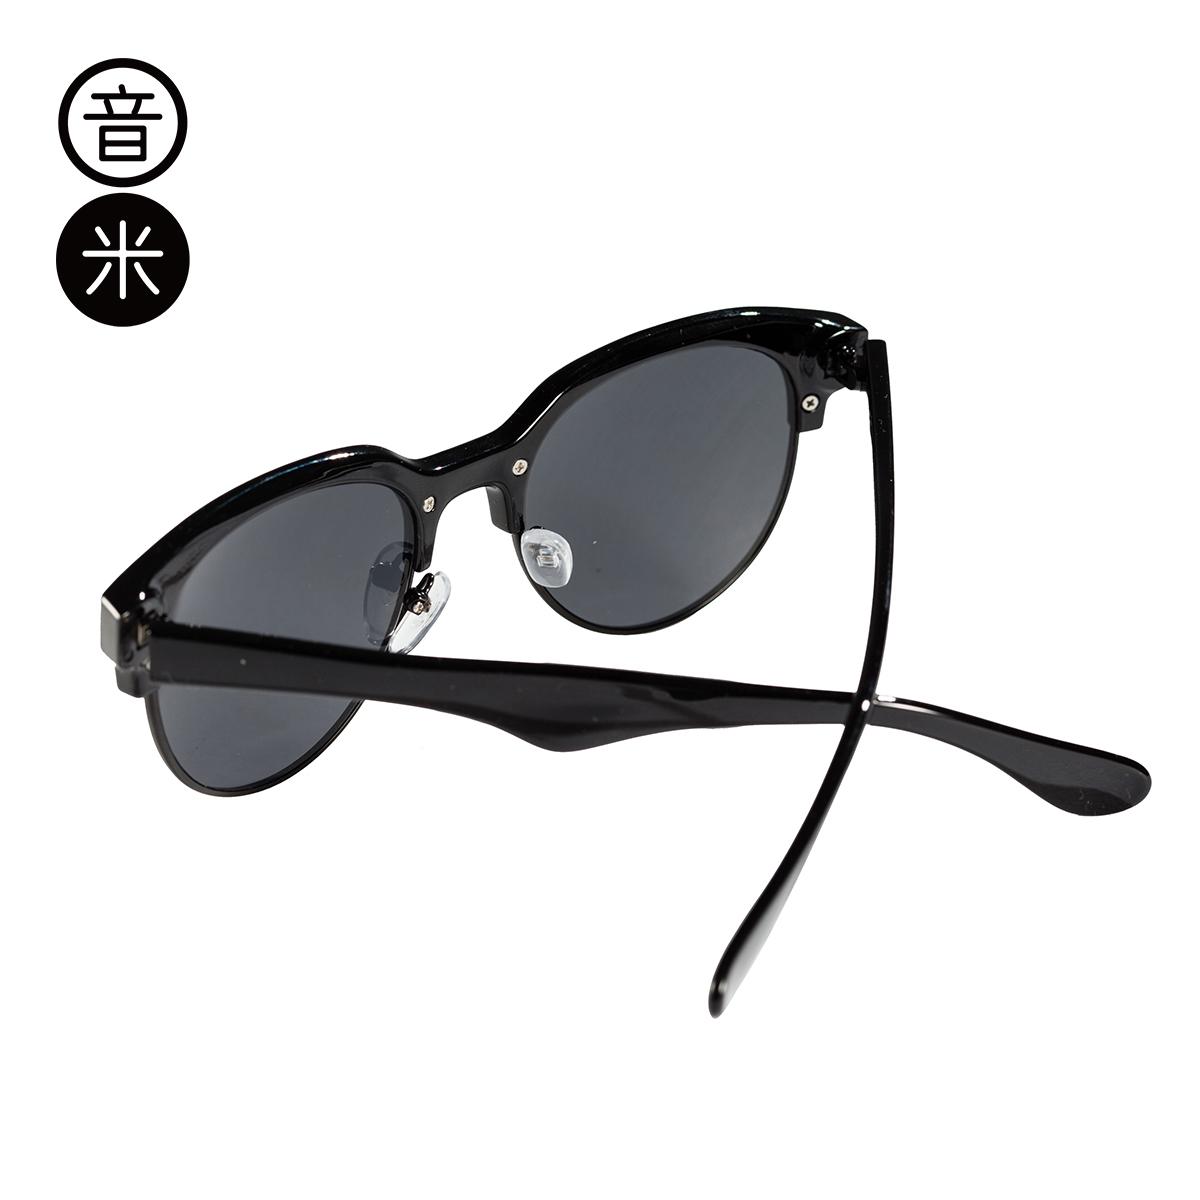 Солнцезащитные очки In Mix 1205 Inmix